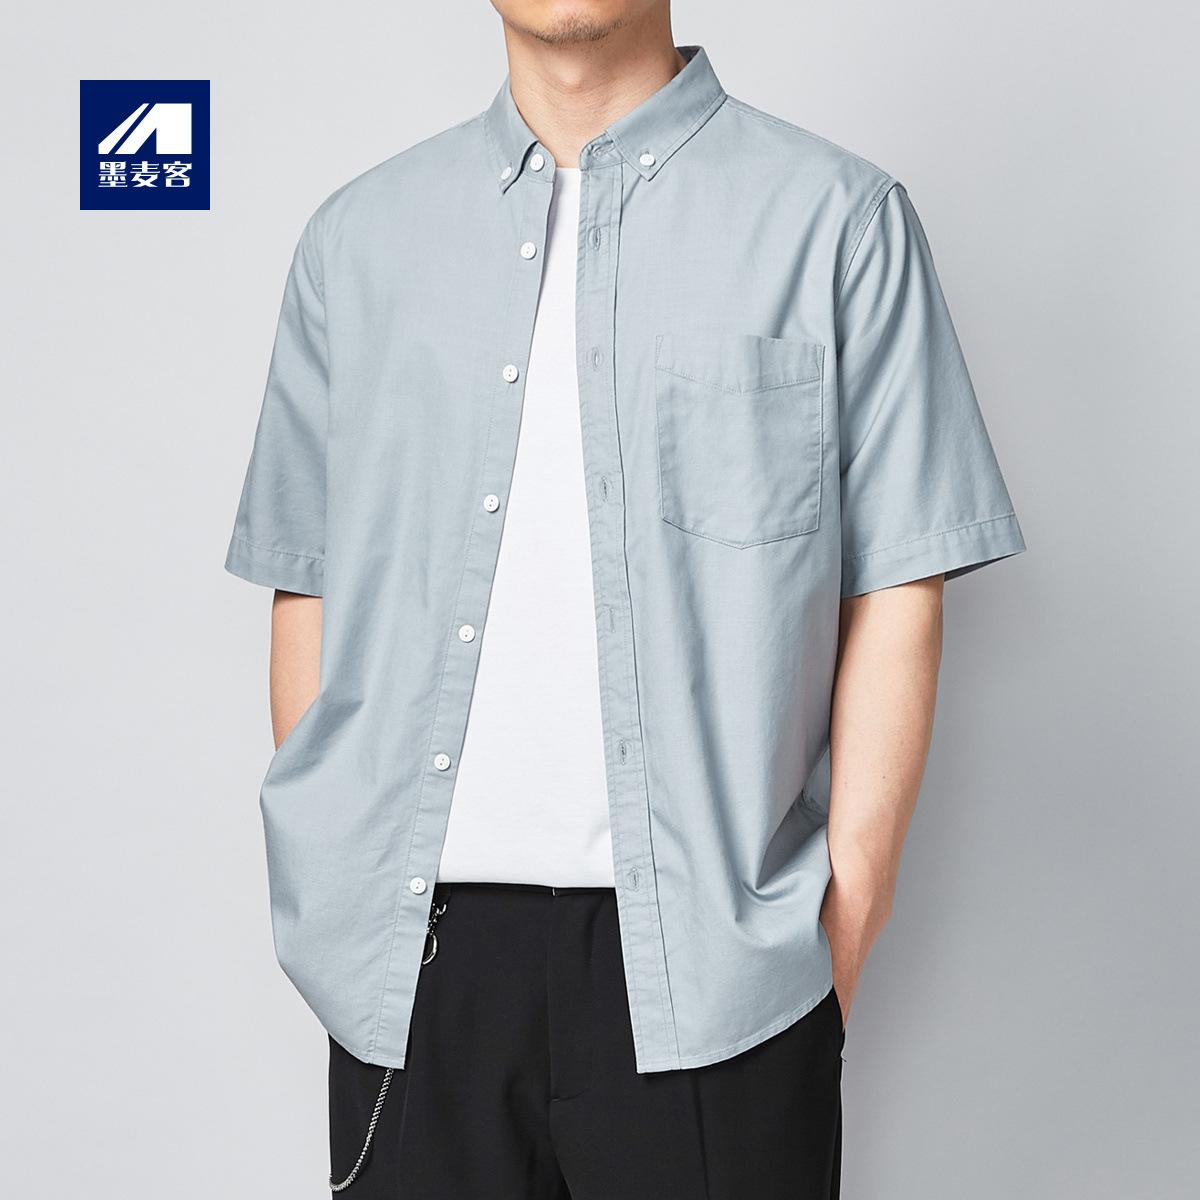 M-MAICCO Momicke men's 2021 summer new tencel cool short-sleeved shirt men's loose thin men's shi